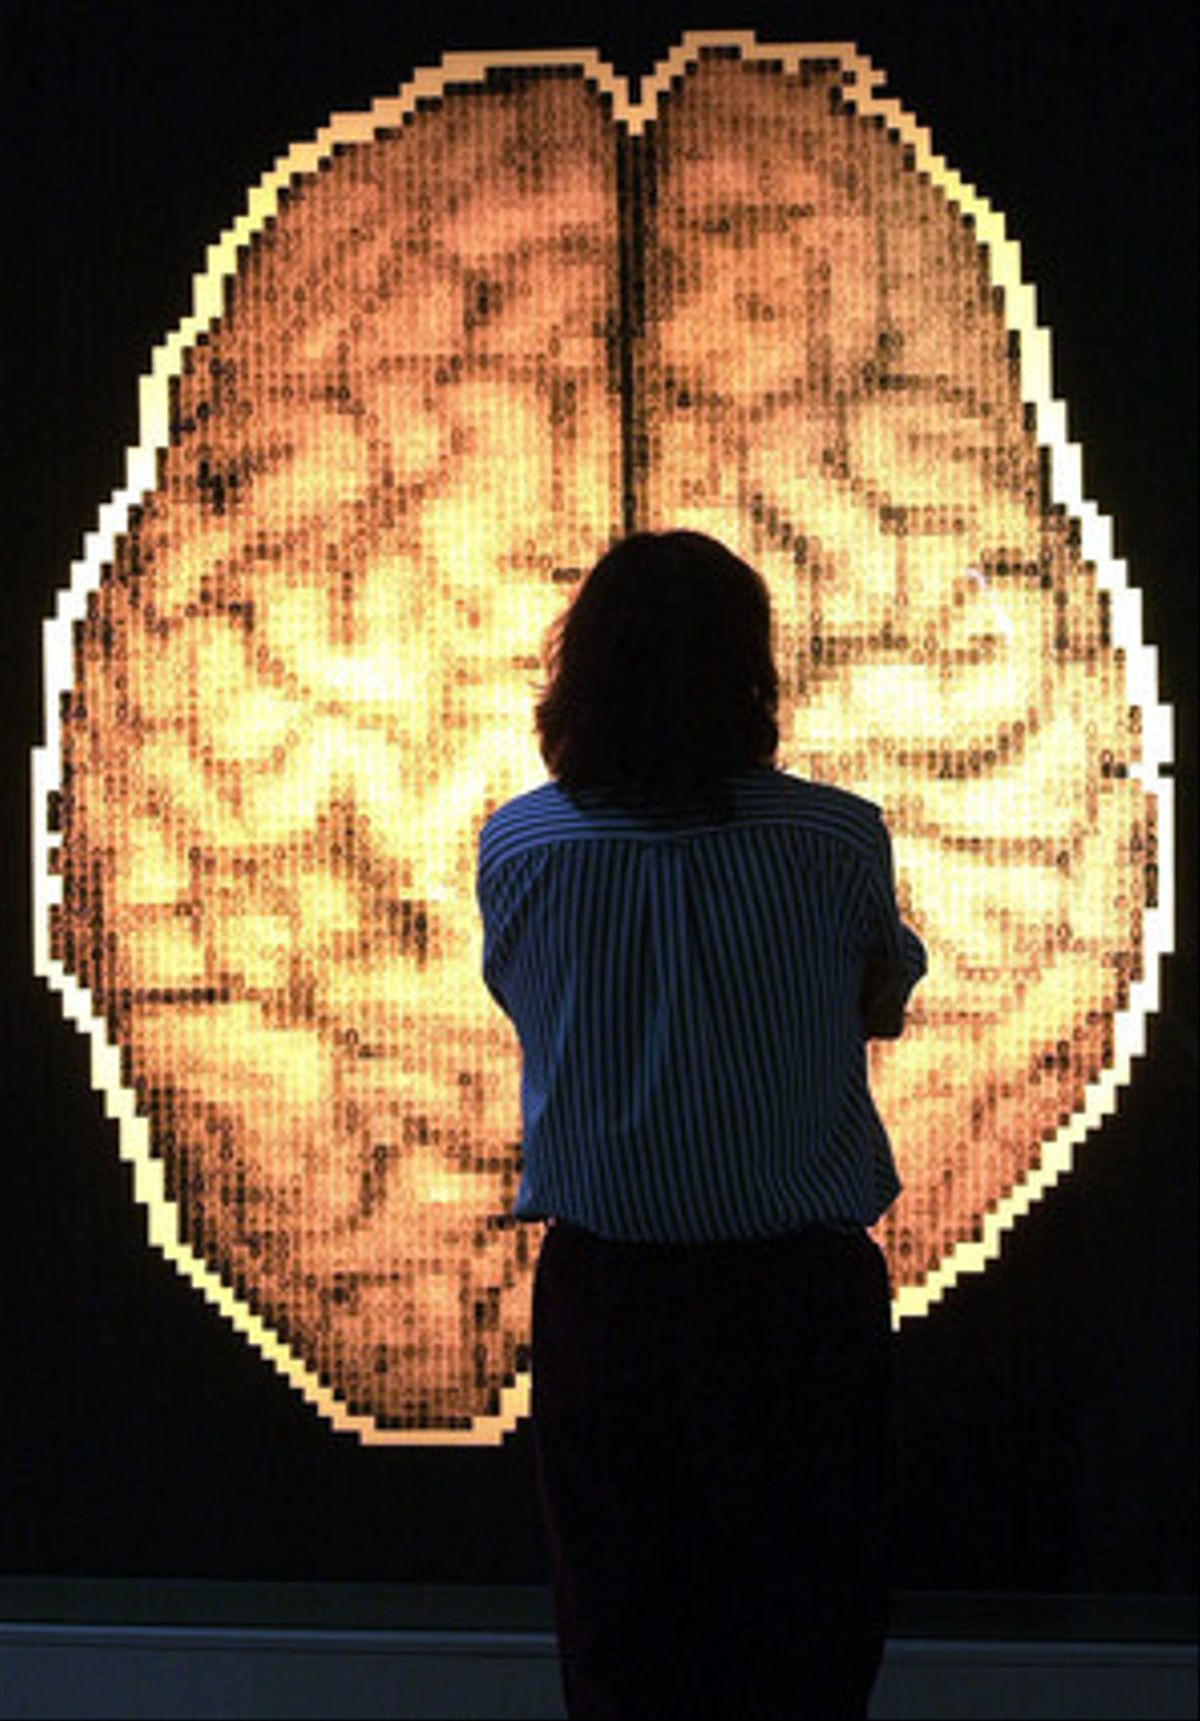 Un visitante observa un mapa del cerebro humano.